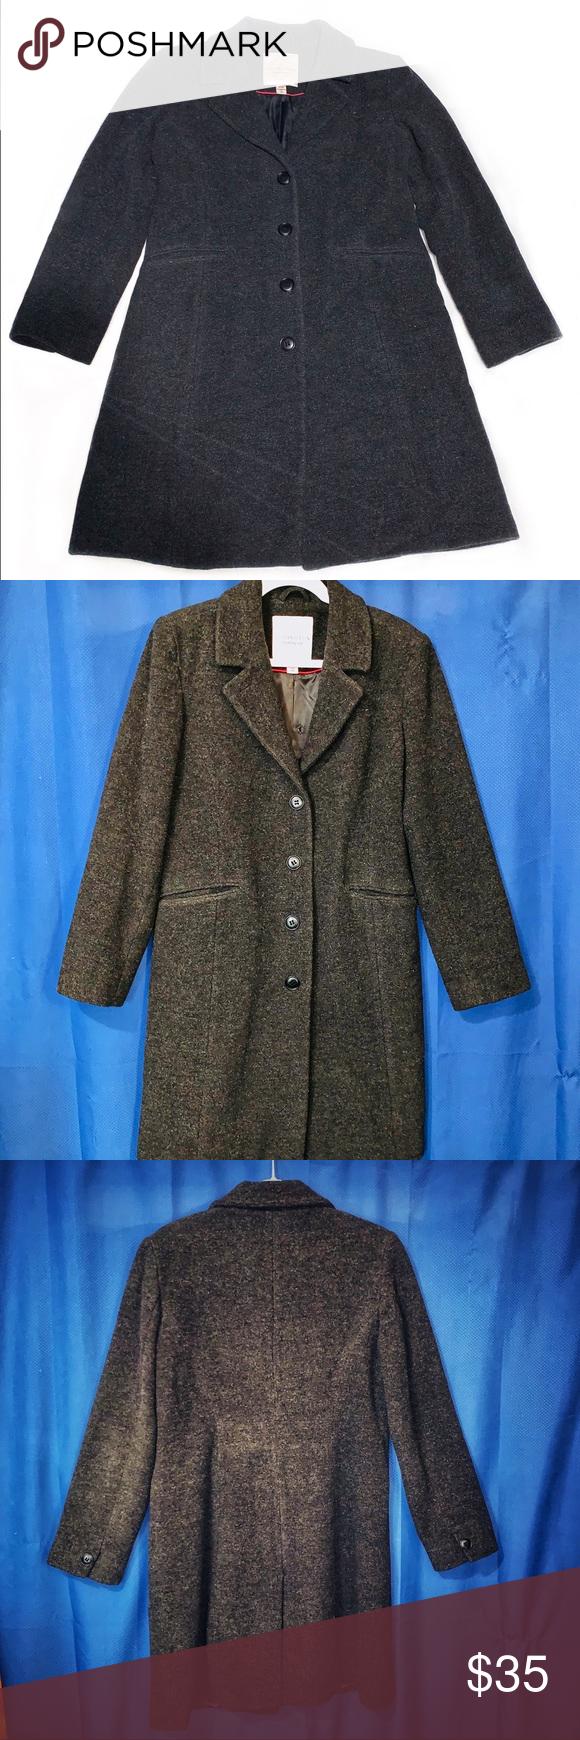 Covington Pea Coat Size M Charcoal Grey Black Coats For Women Wool Peacoat Peacoat Outfit [ 1740 x 580 Pixel ]